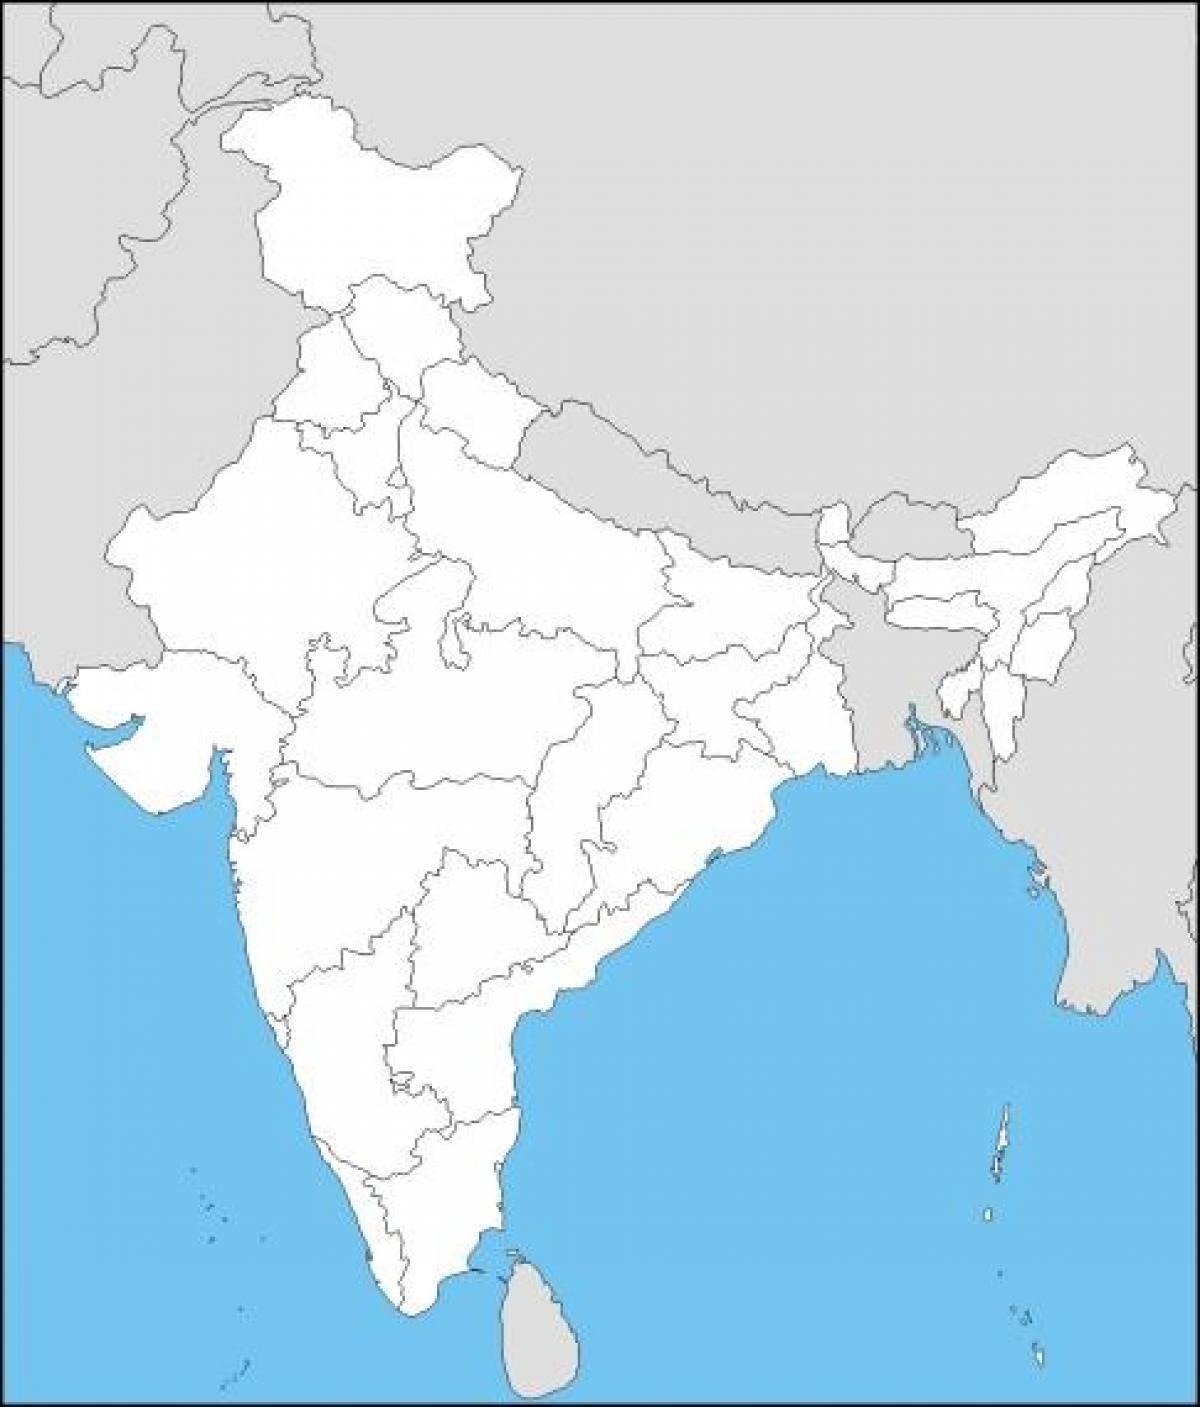 asia kart quiz India kart quiz   Kart over India quiz (Sør Asia   Asia) asia kart quiz